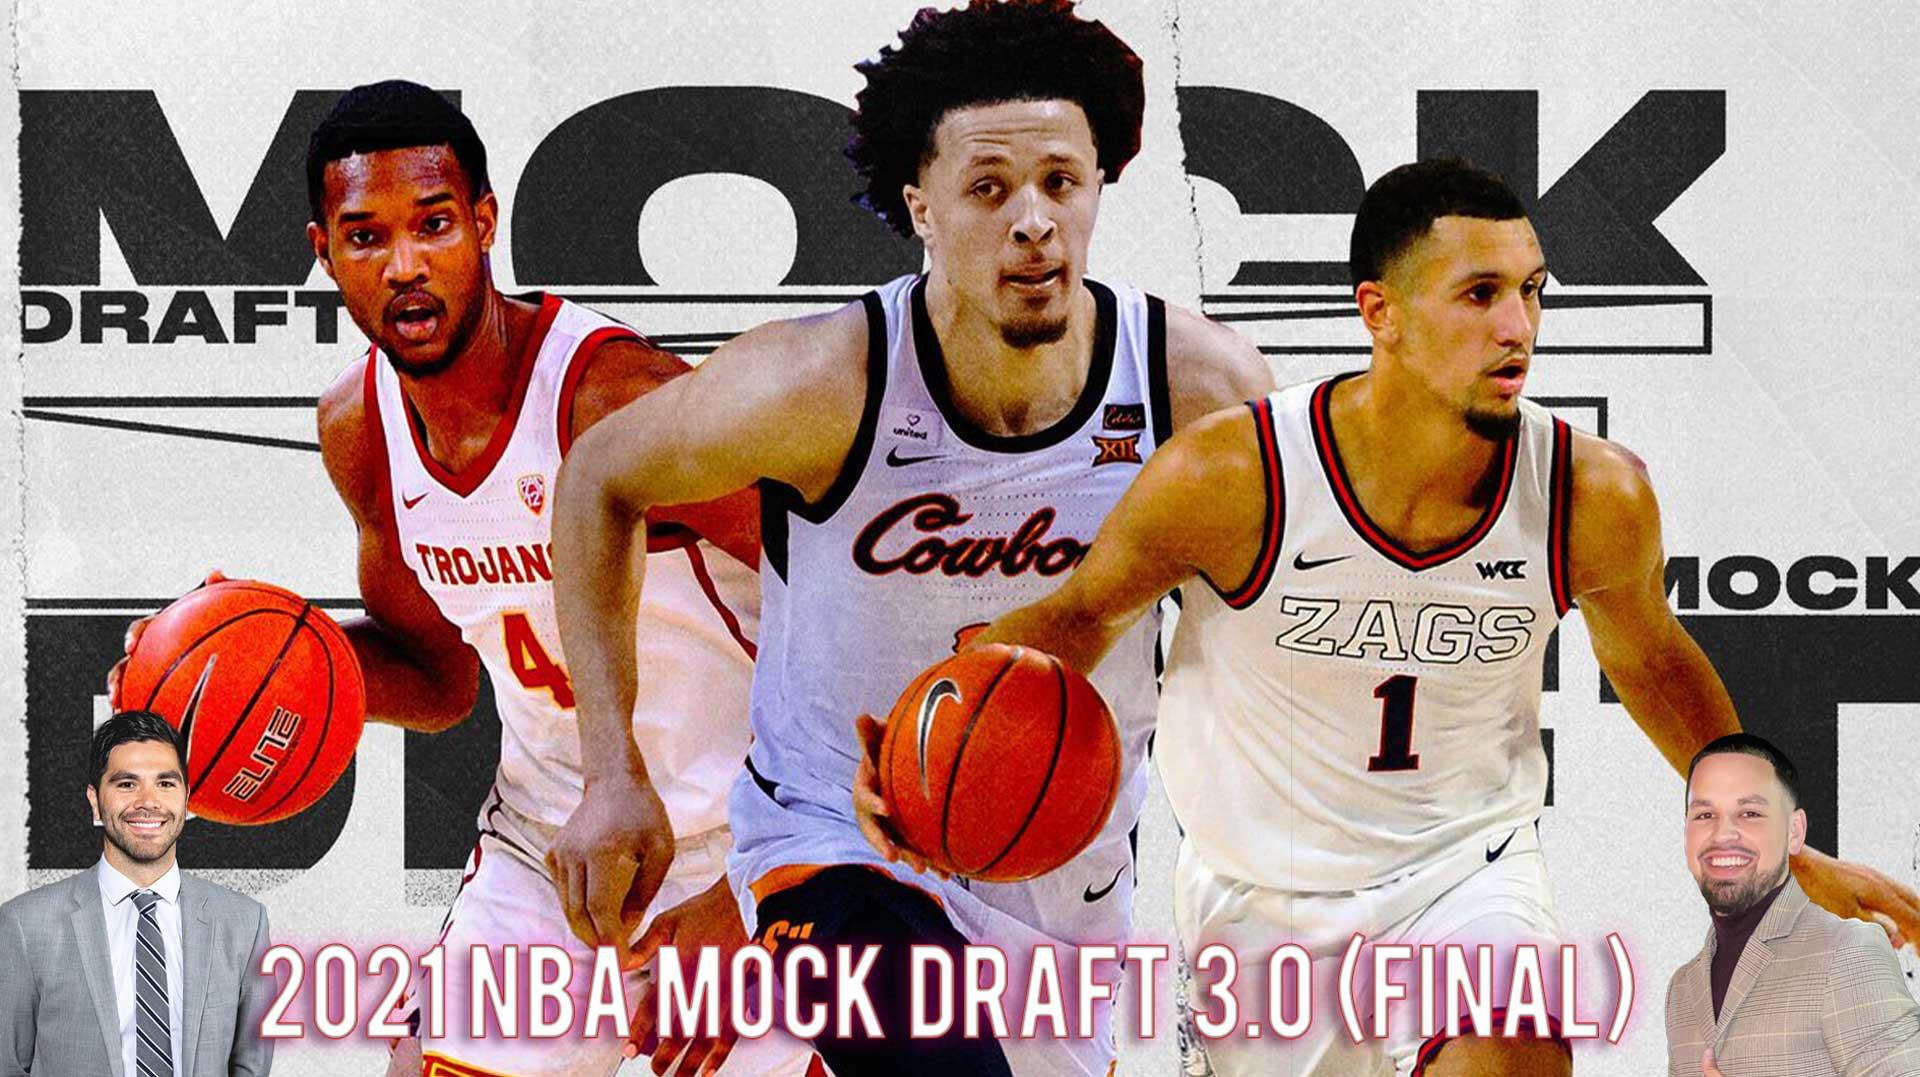 2021 NBA Mock Draft 3.0 (FINAL) Picks 1-30